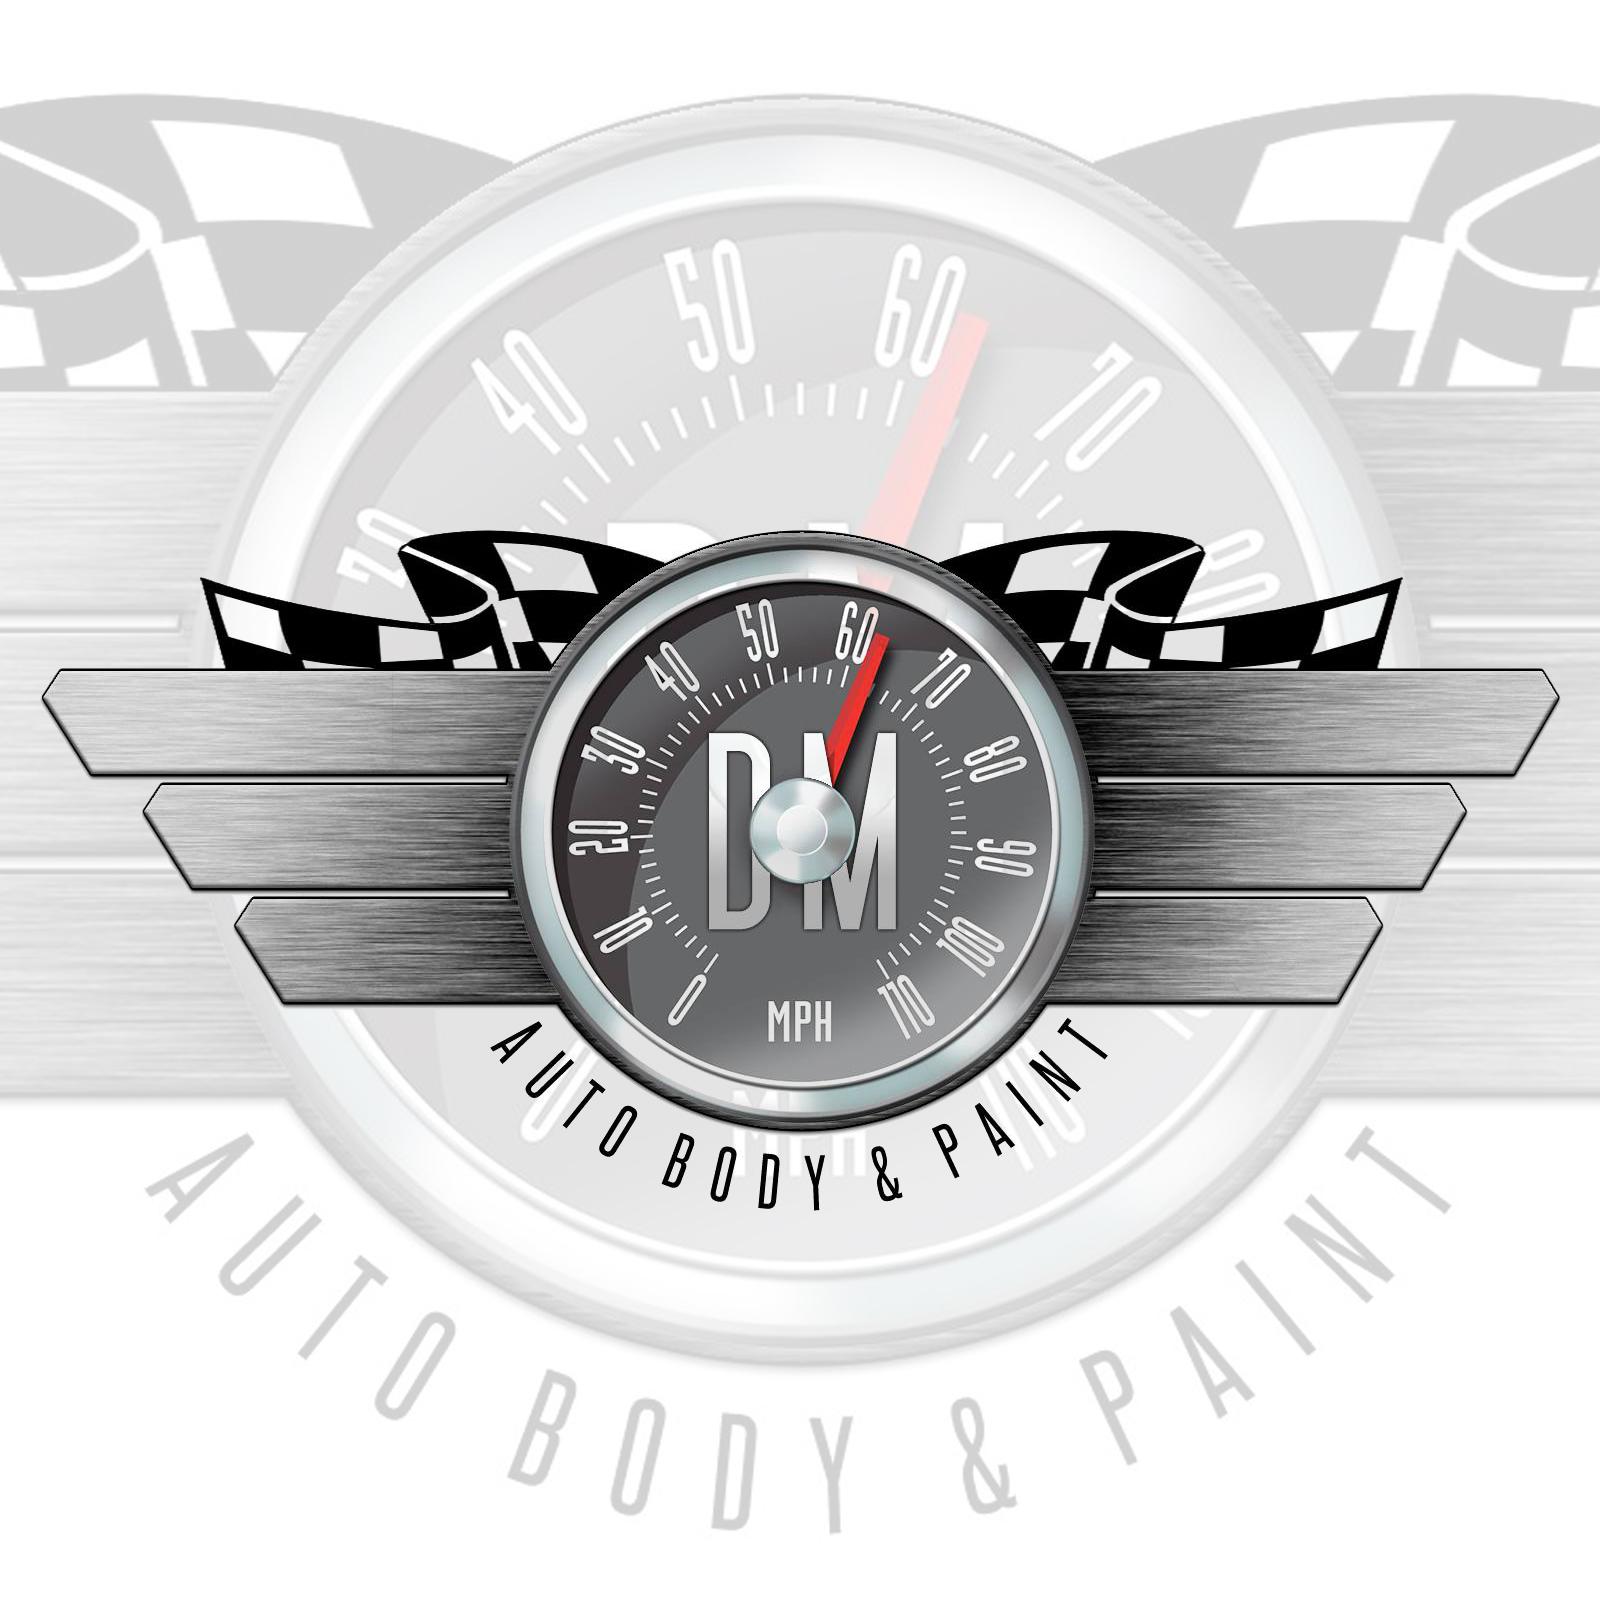 DM+Auto+Body.jpg